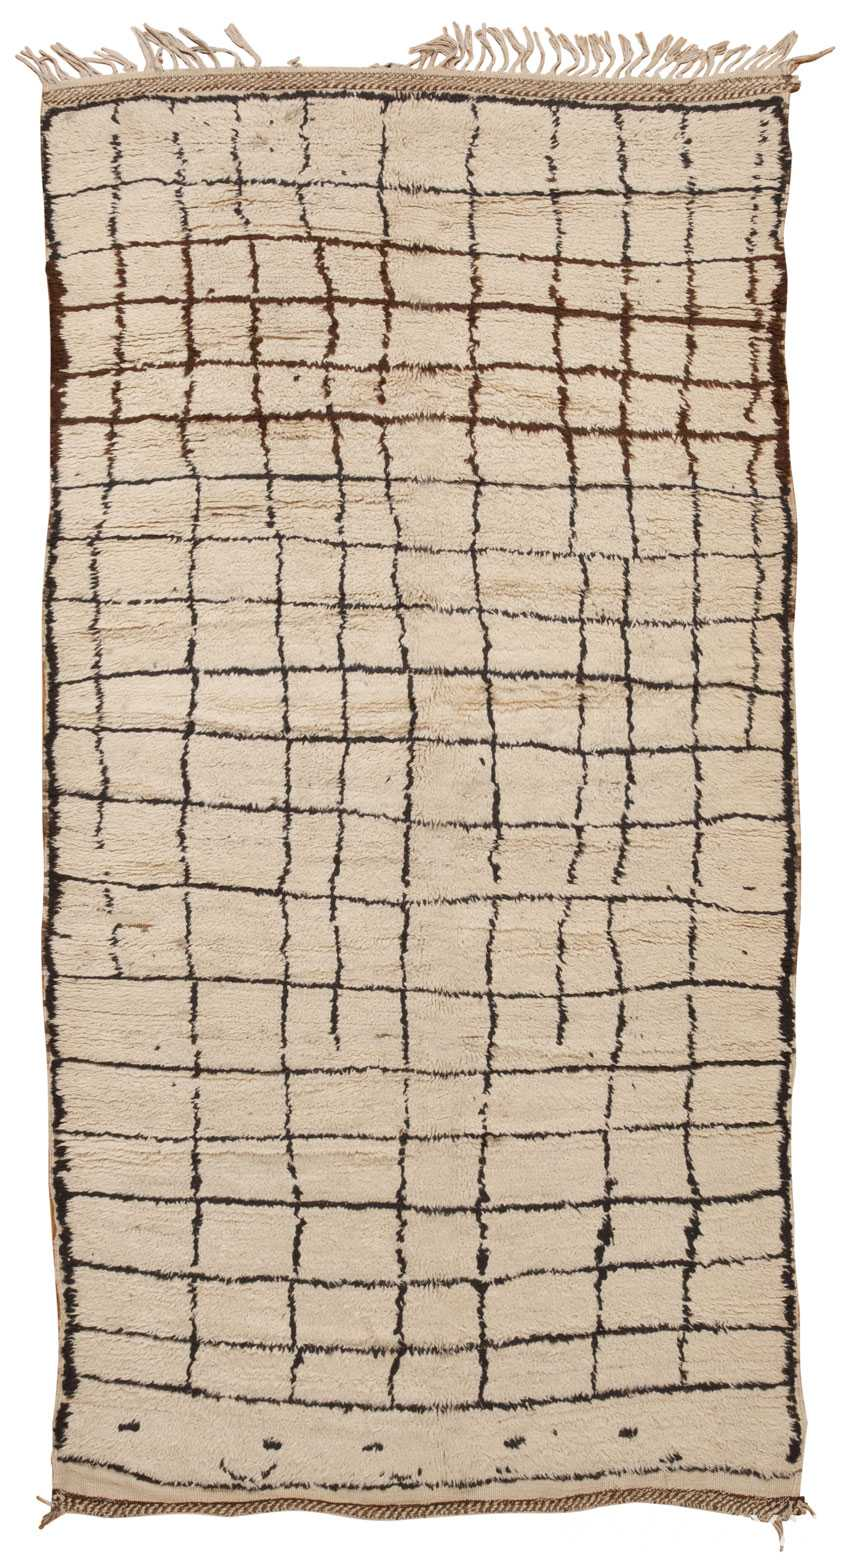 Moroccan Carpet 45358 Detail/Large View